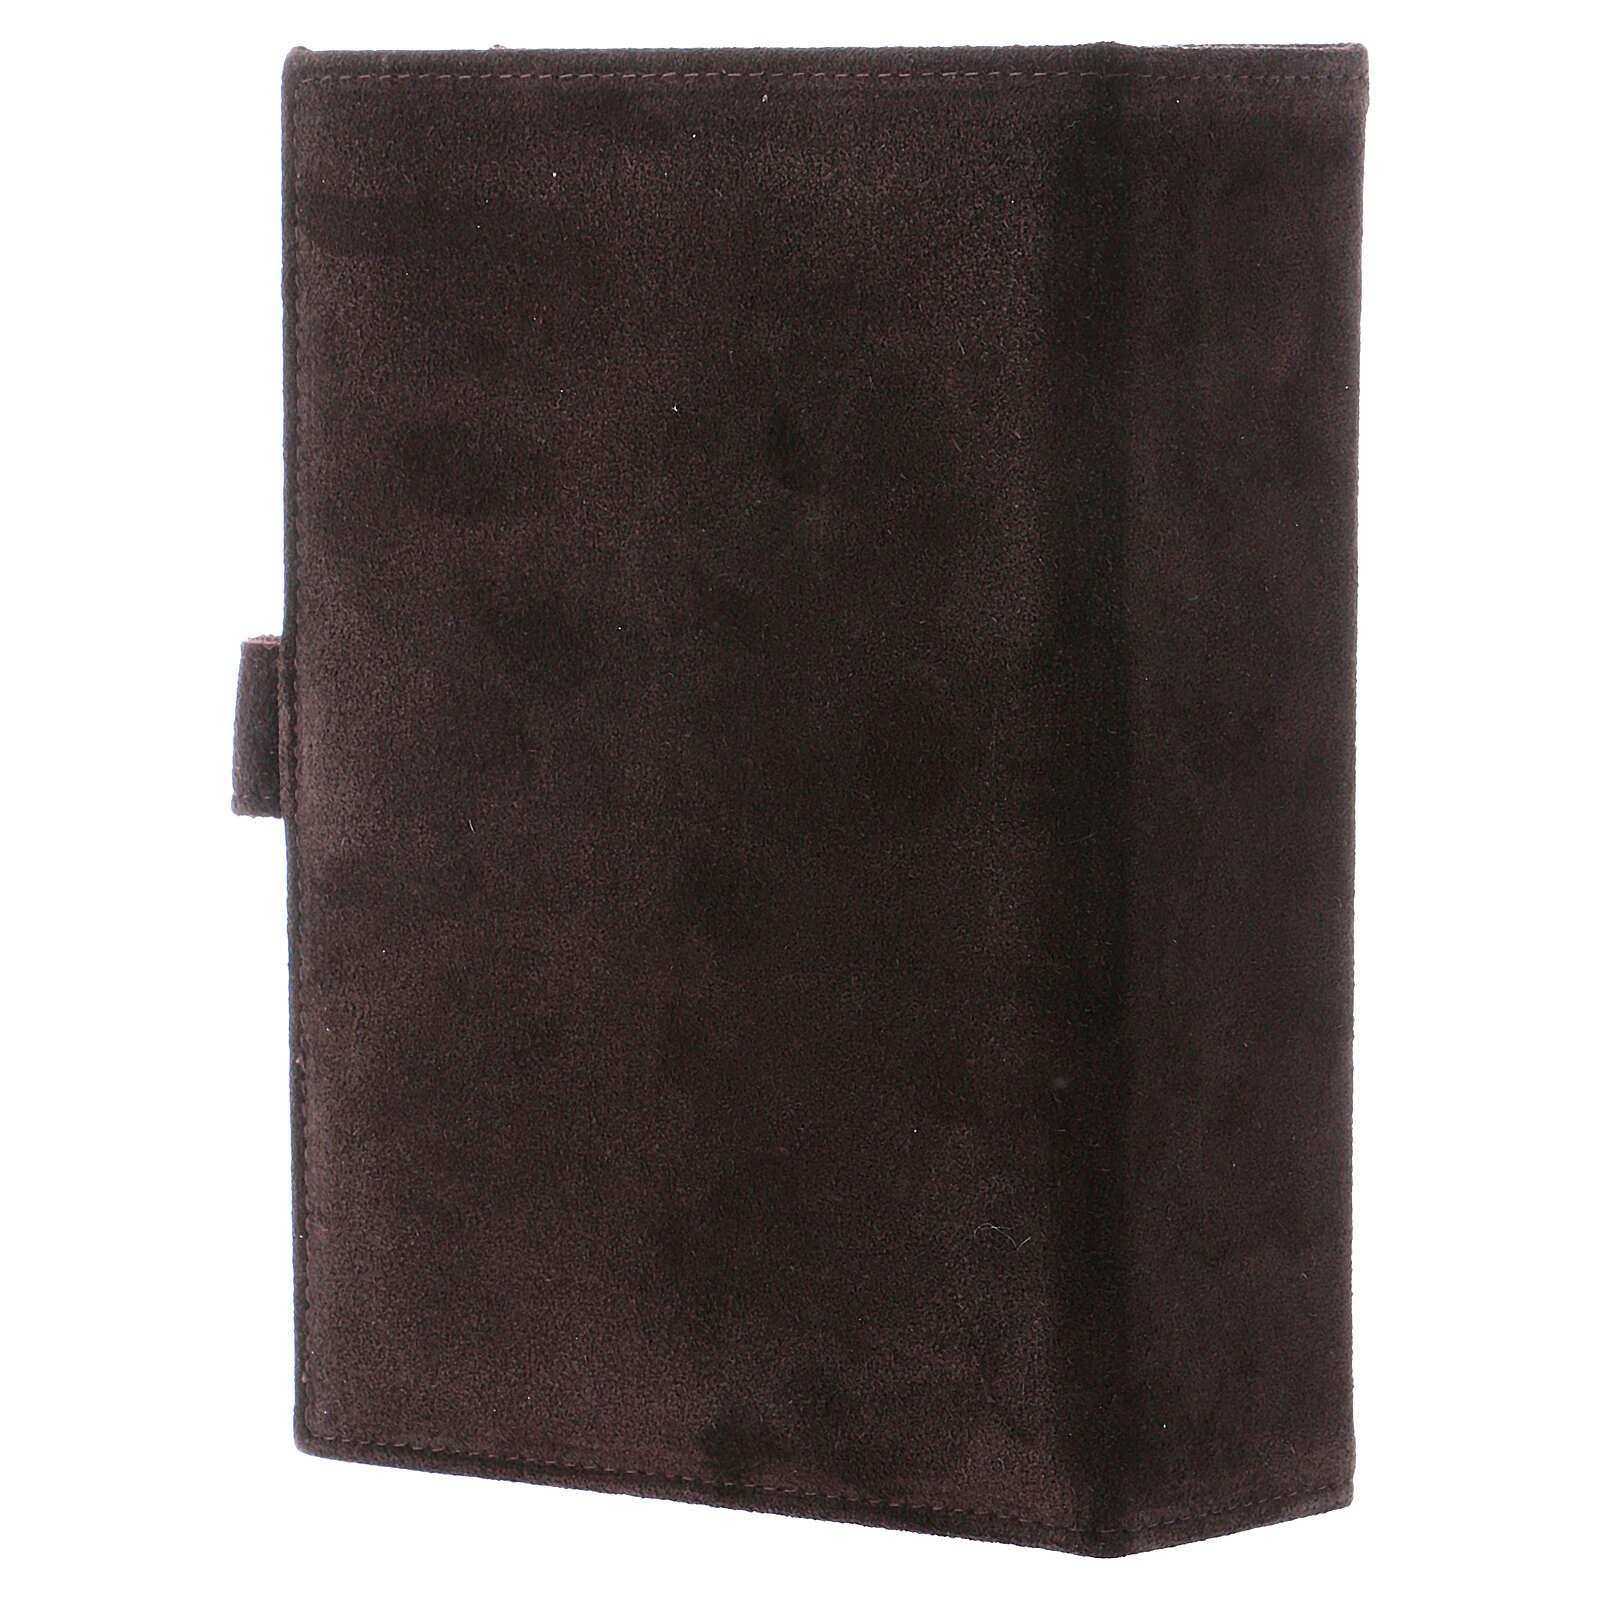 Custodia Bibbia Gerusalemme pelle scamosciata marrone 4